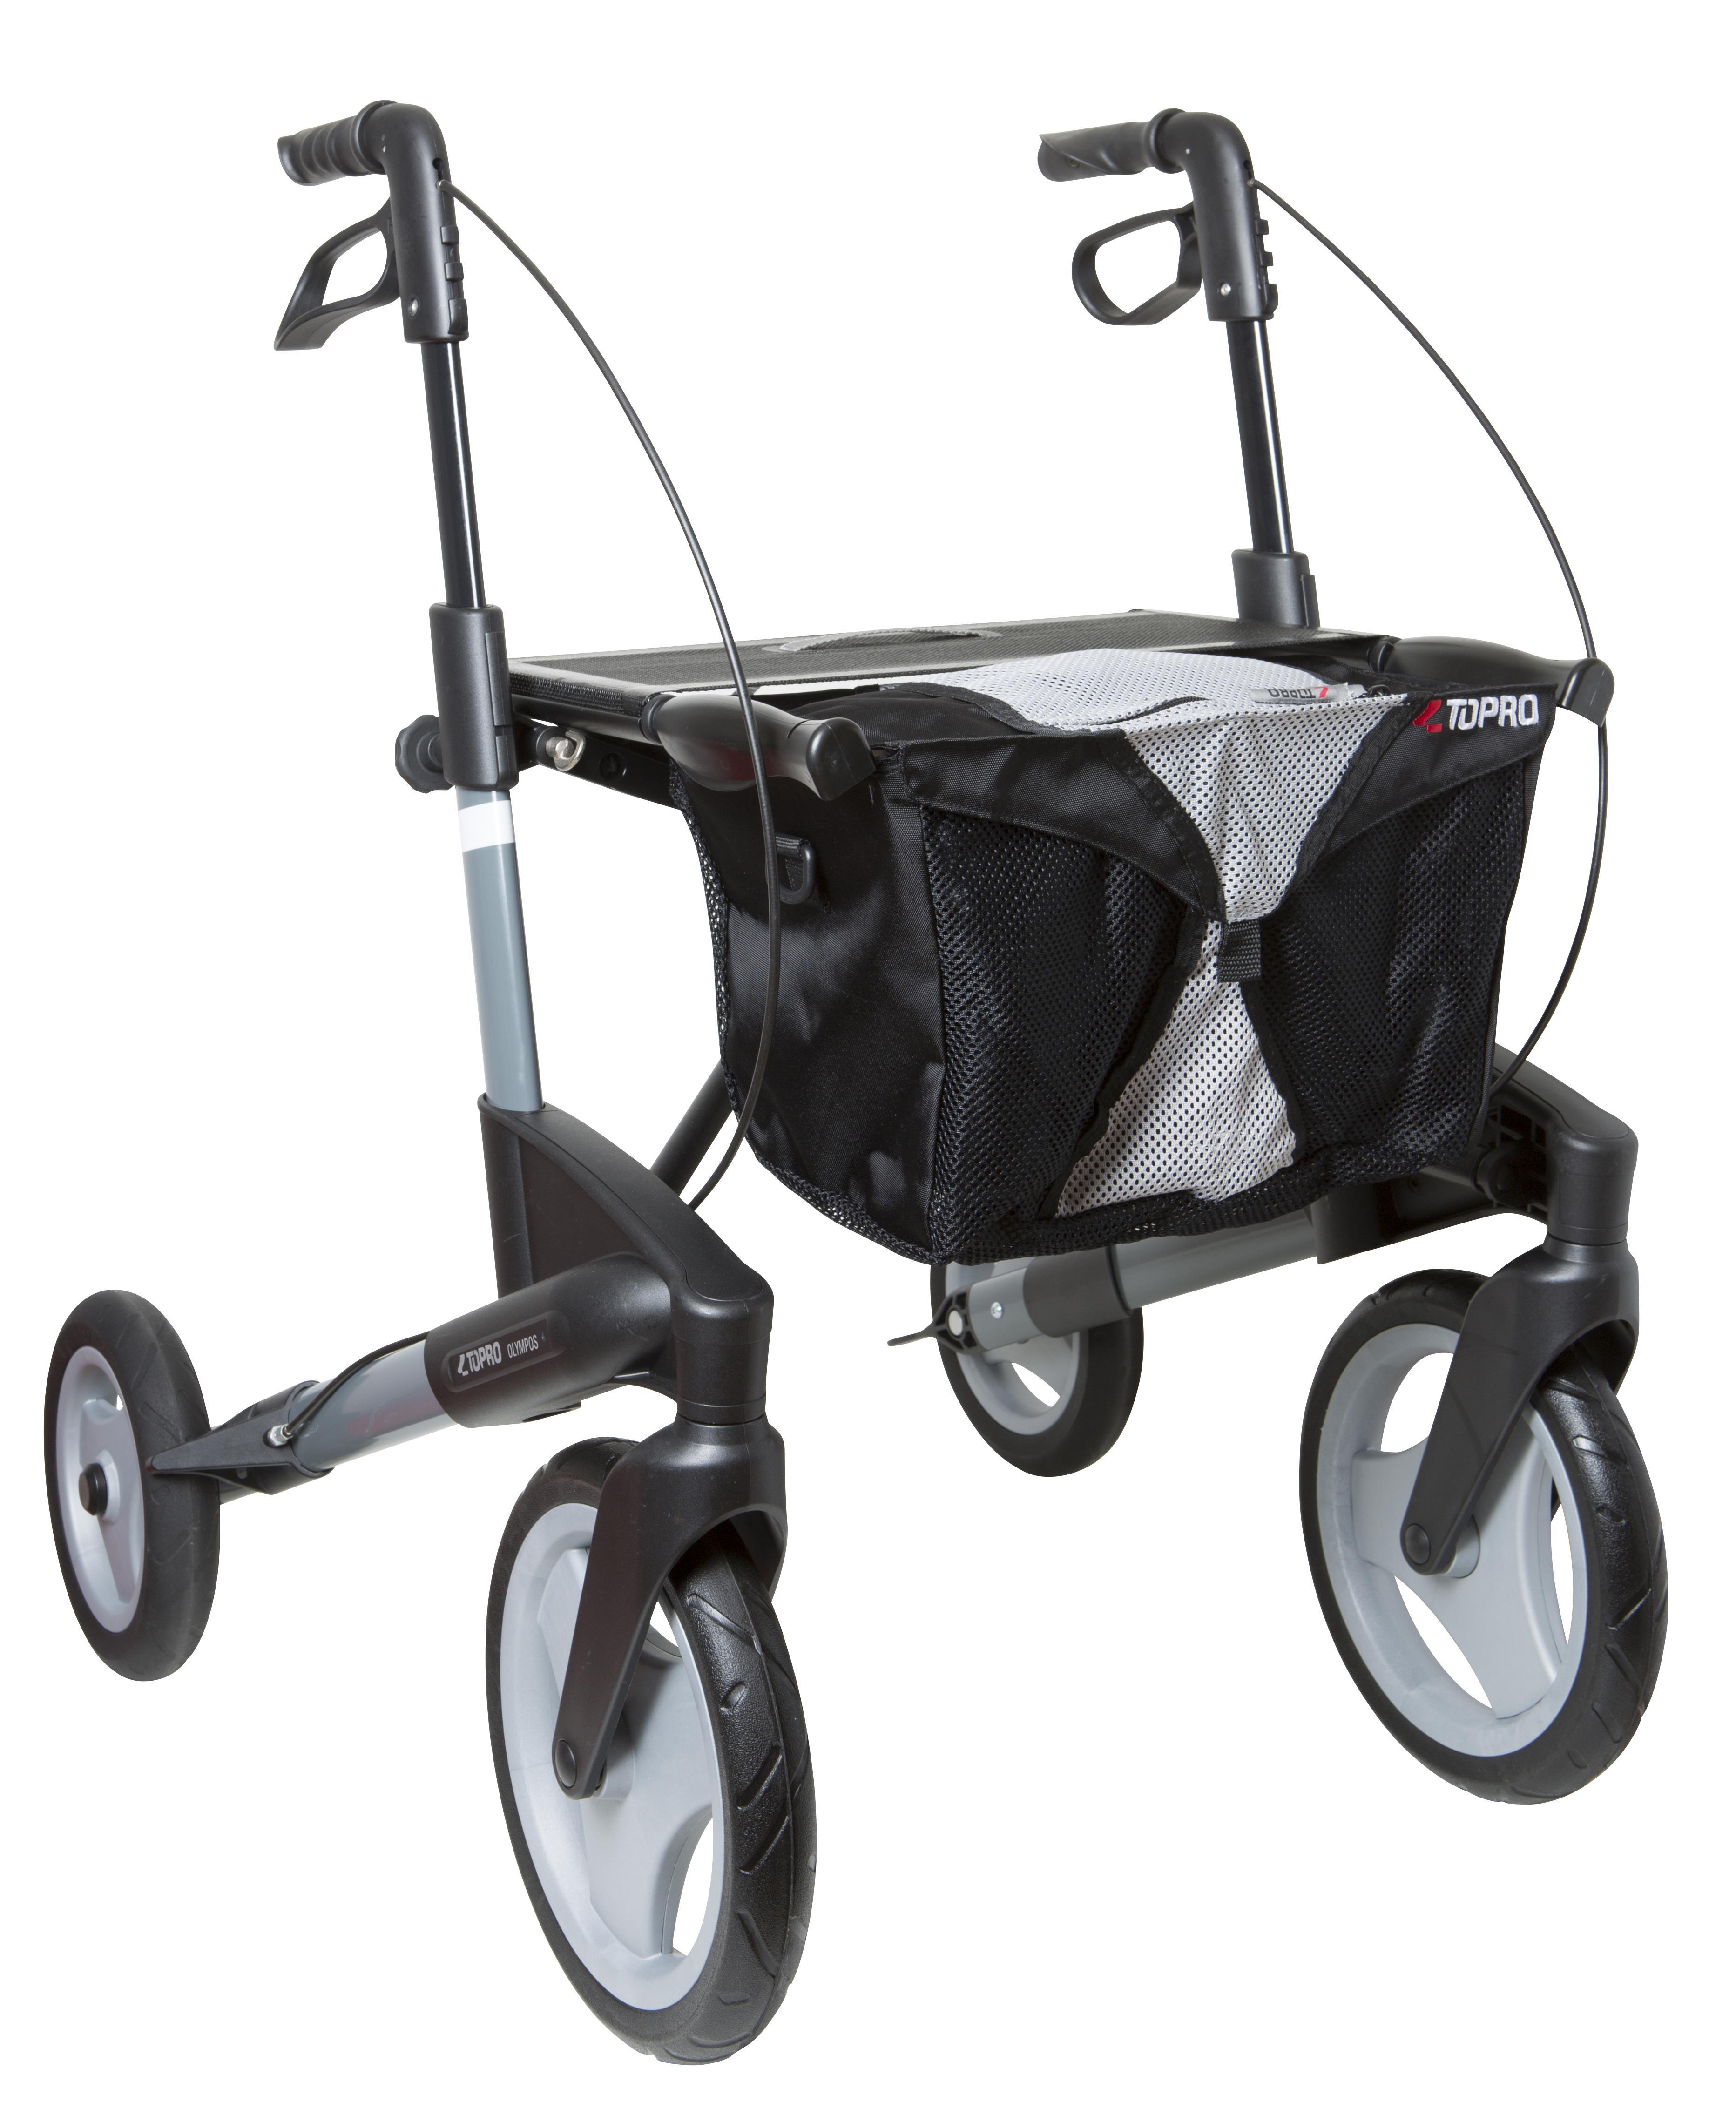 Topro Olympos (udendørs rollator) – pris 3795.00